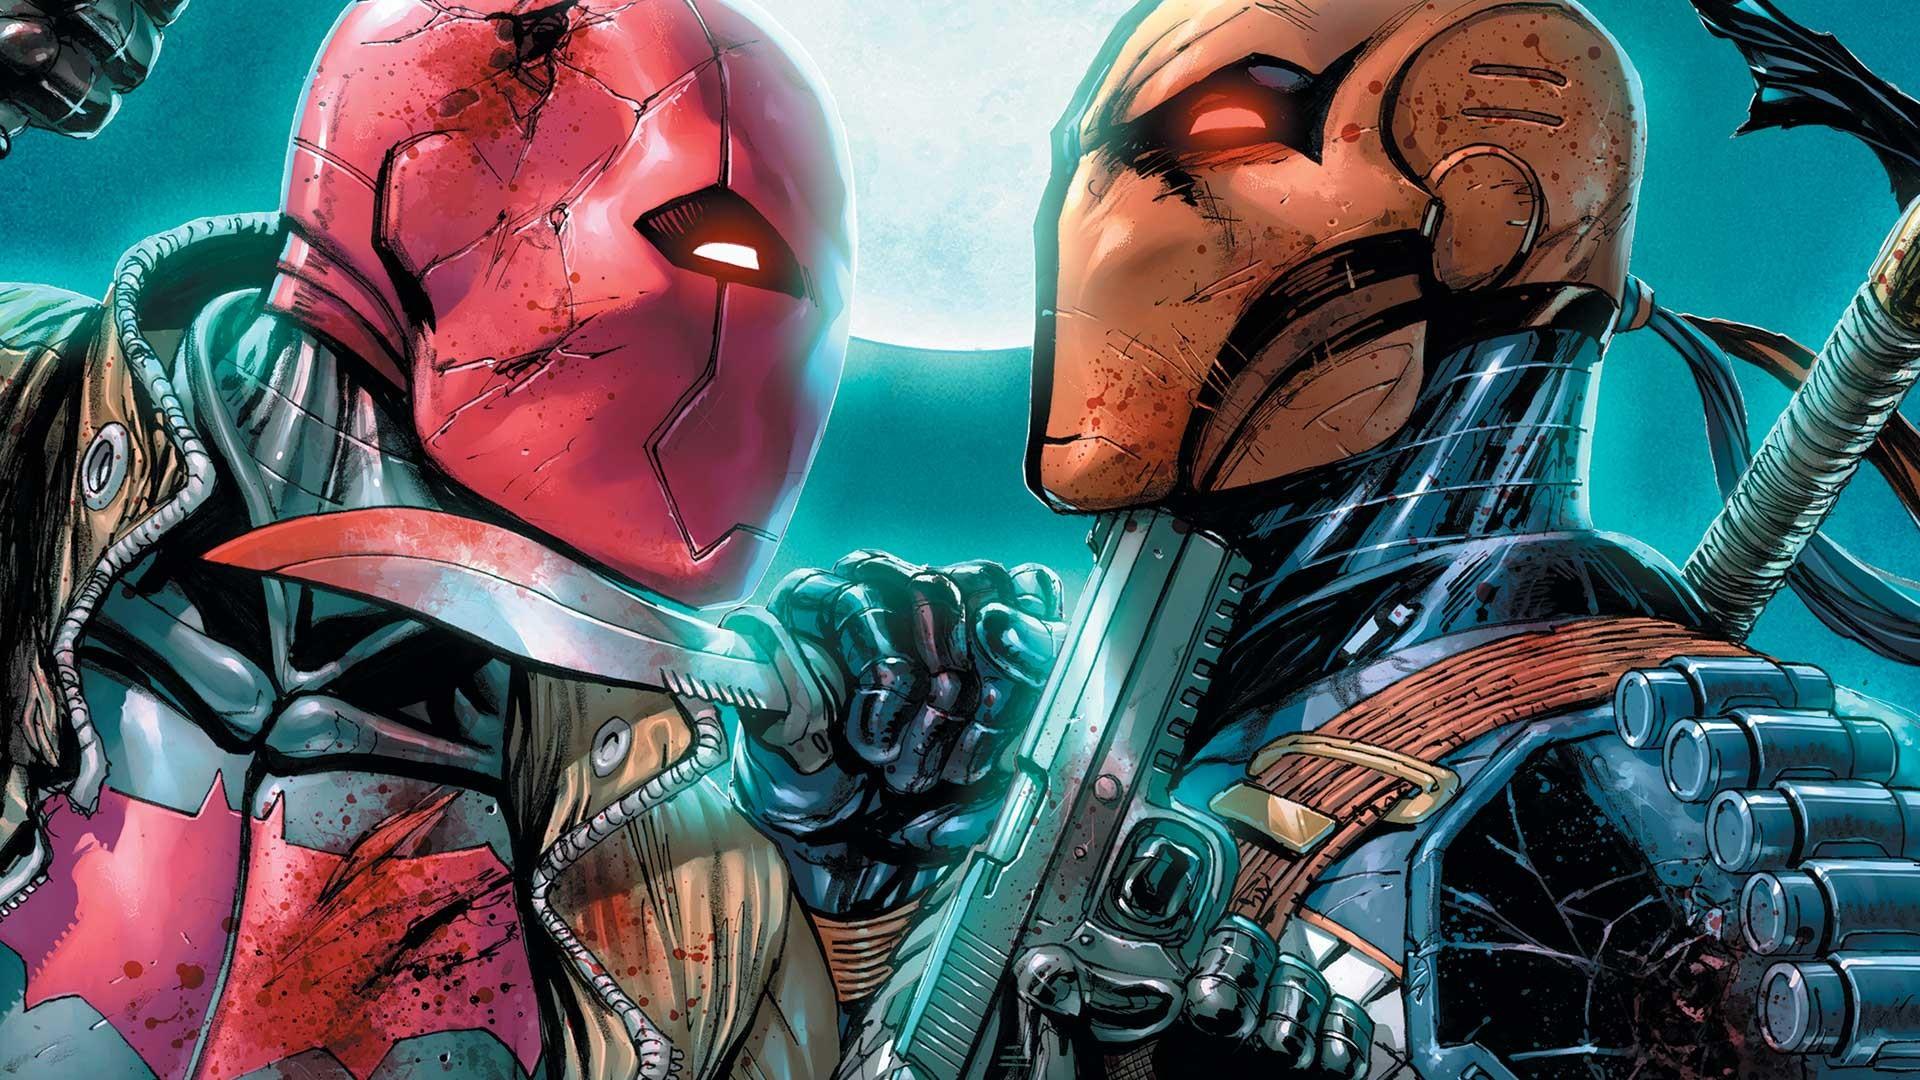 Comics – Deathstroke Red Hood Wallpaper